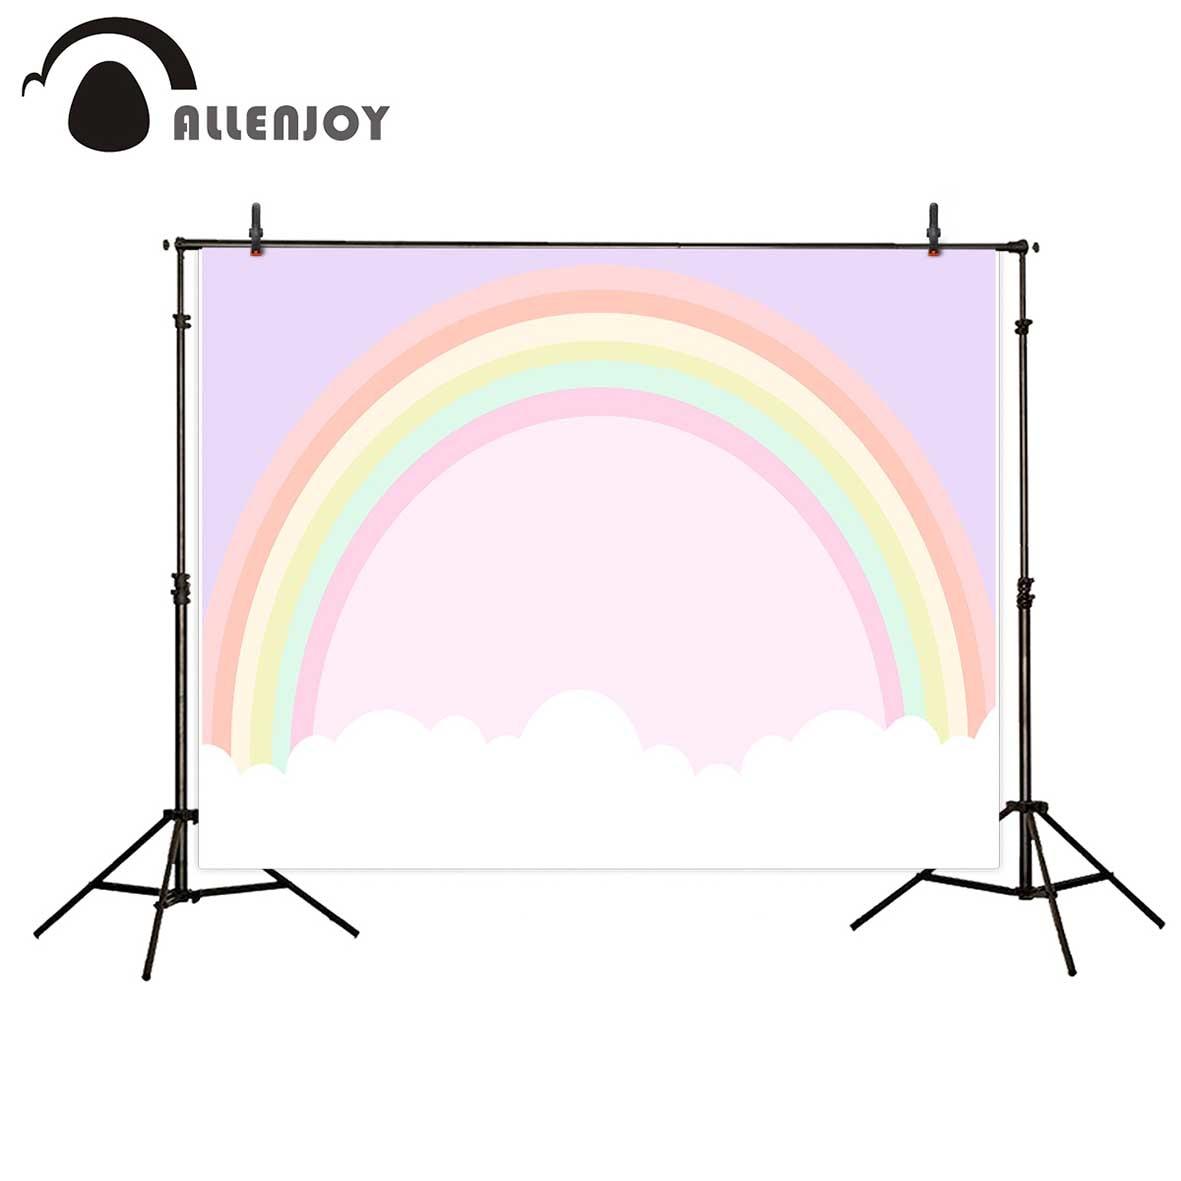 Allenjoy photographic background Rainbow Cloud Custom Birthday Children new backdrop photocall photo print customize fotografia